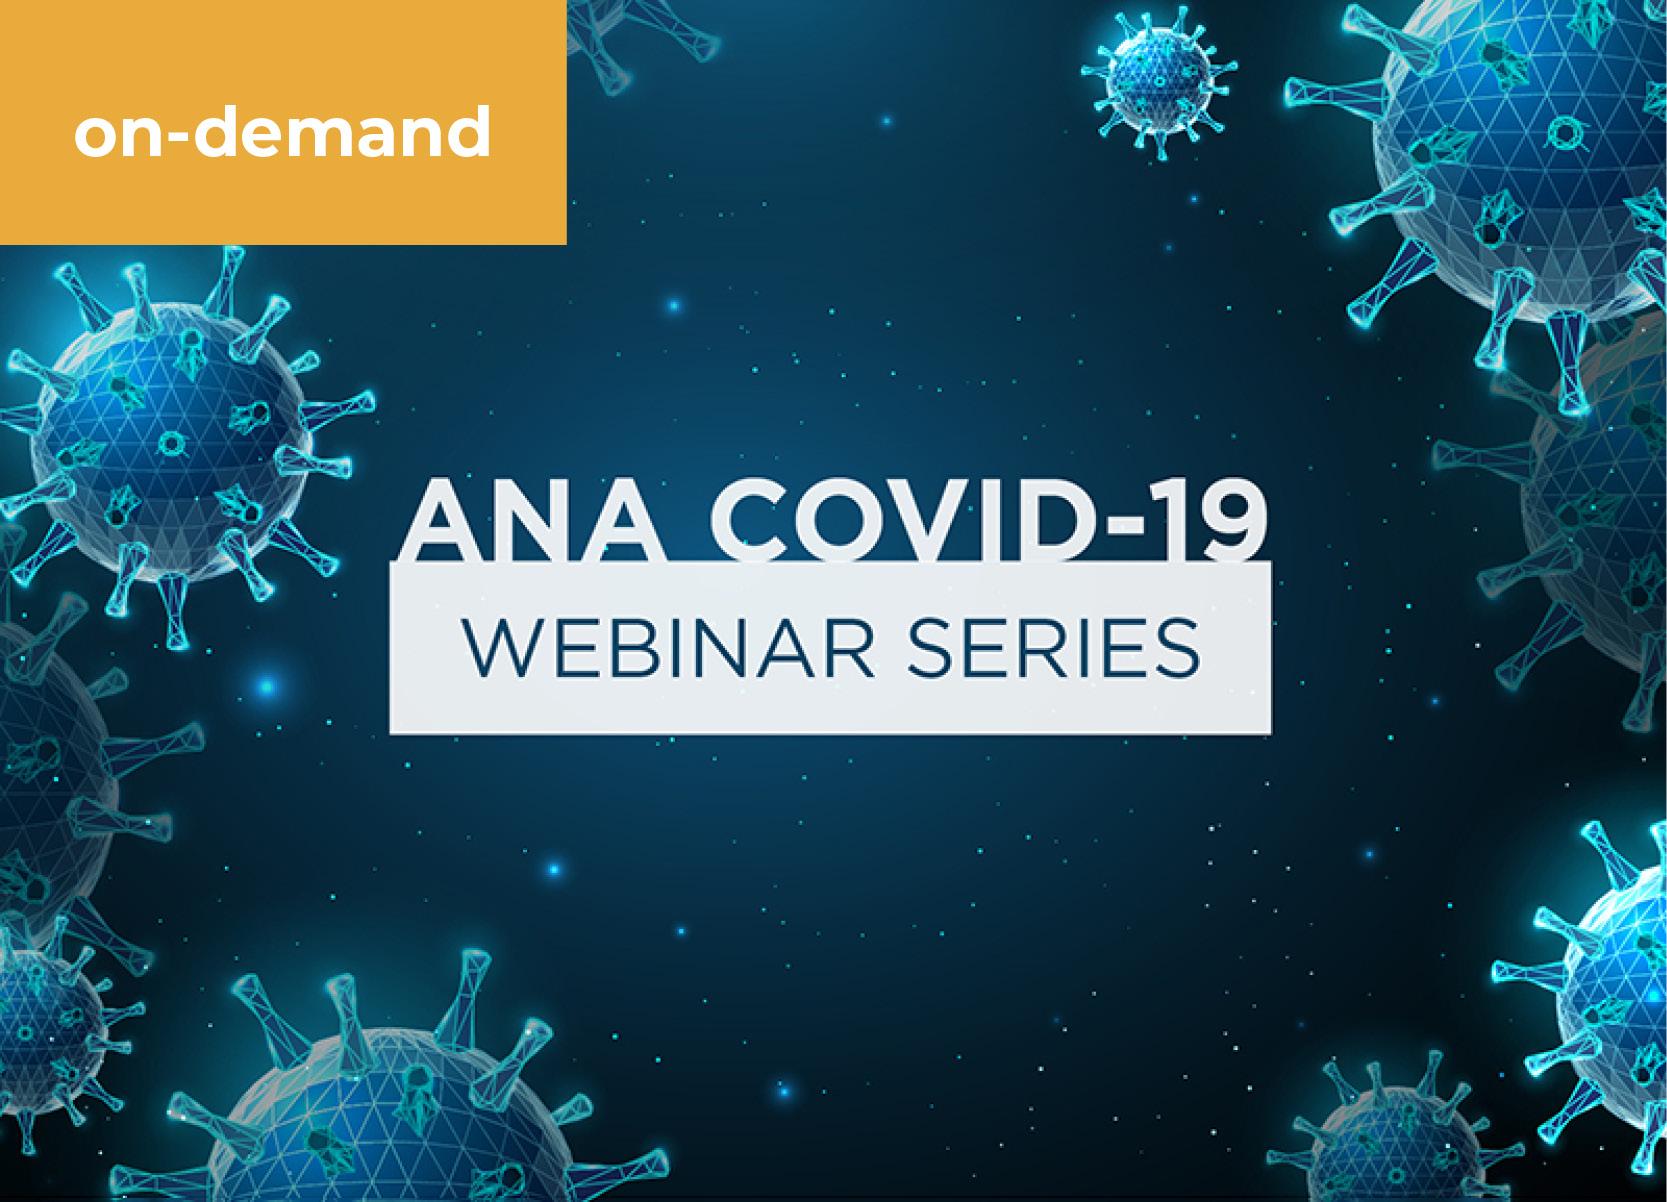 ANA COVID-19 Webinar Series